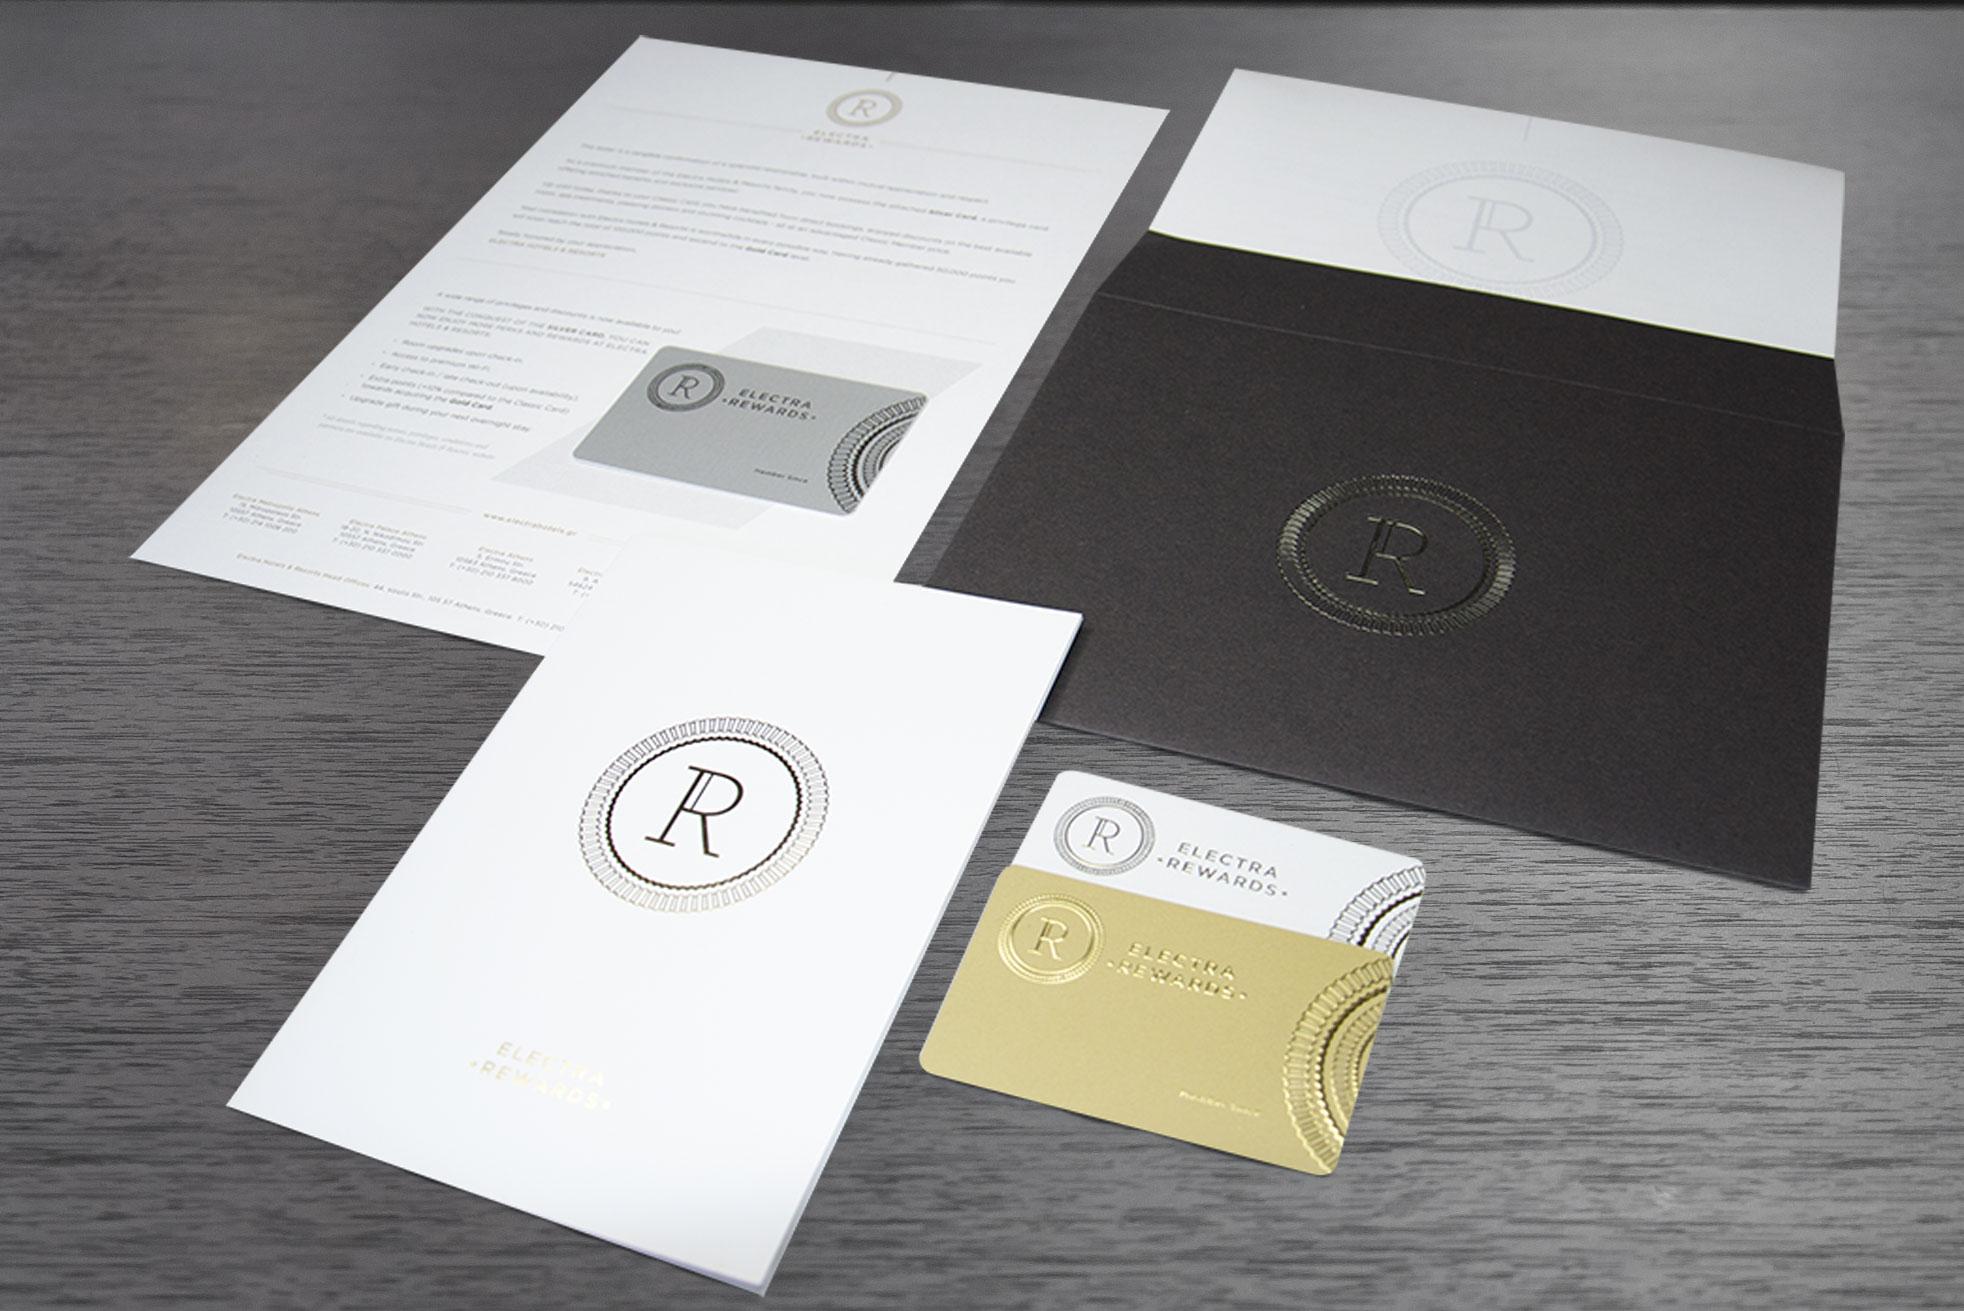 Key Folder Designs